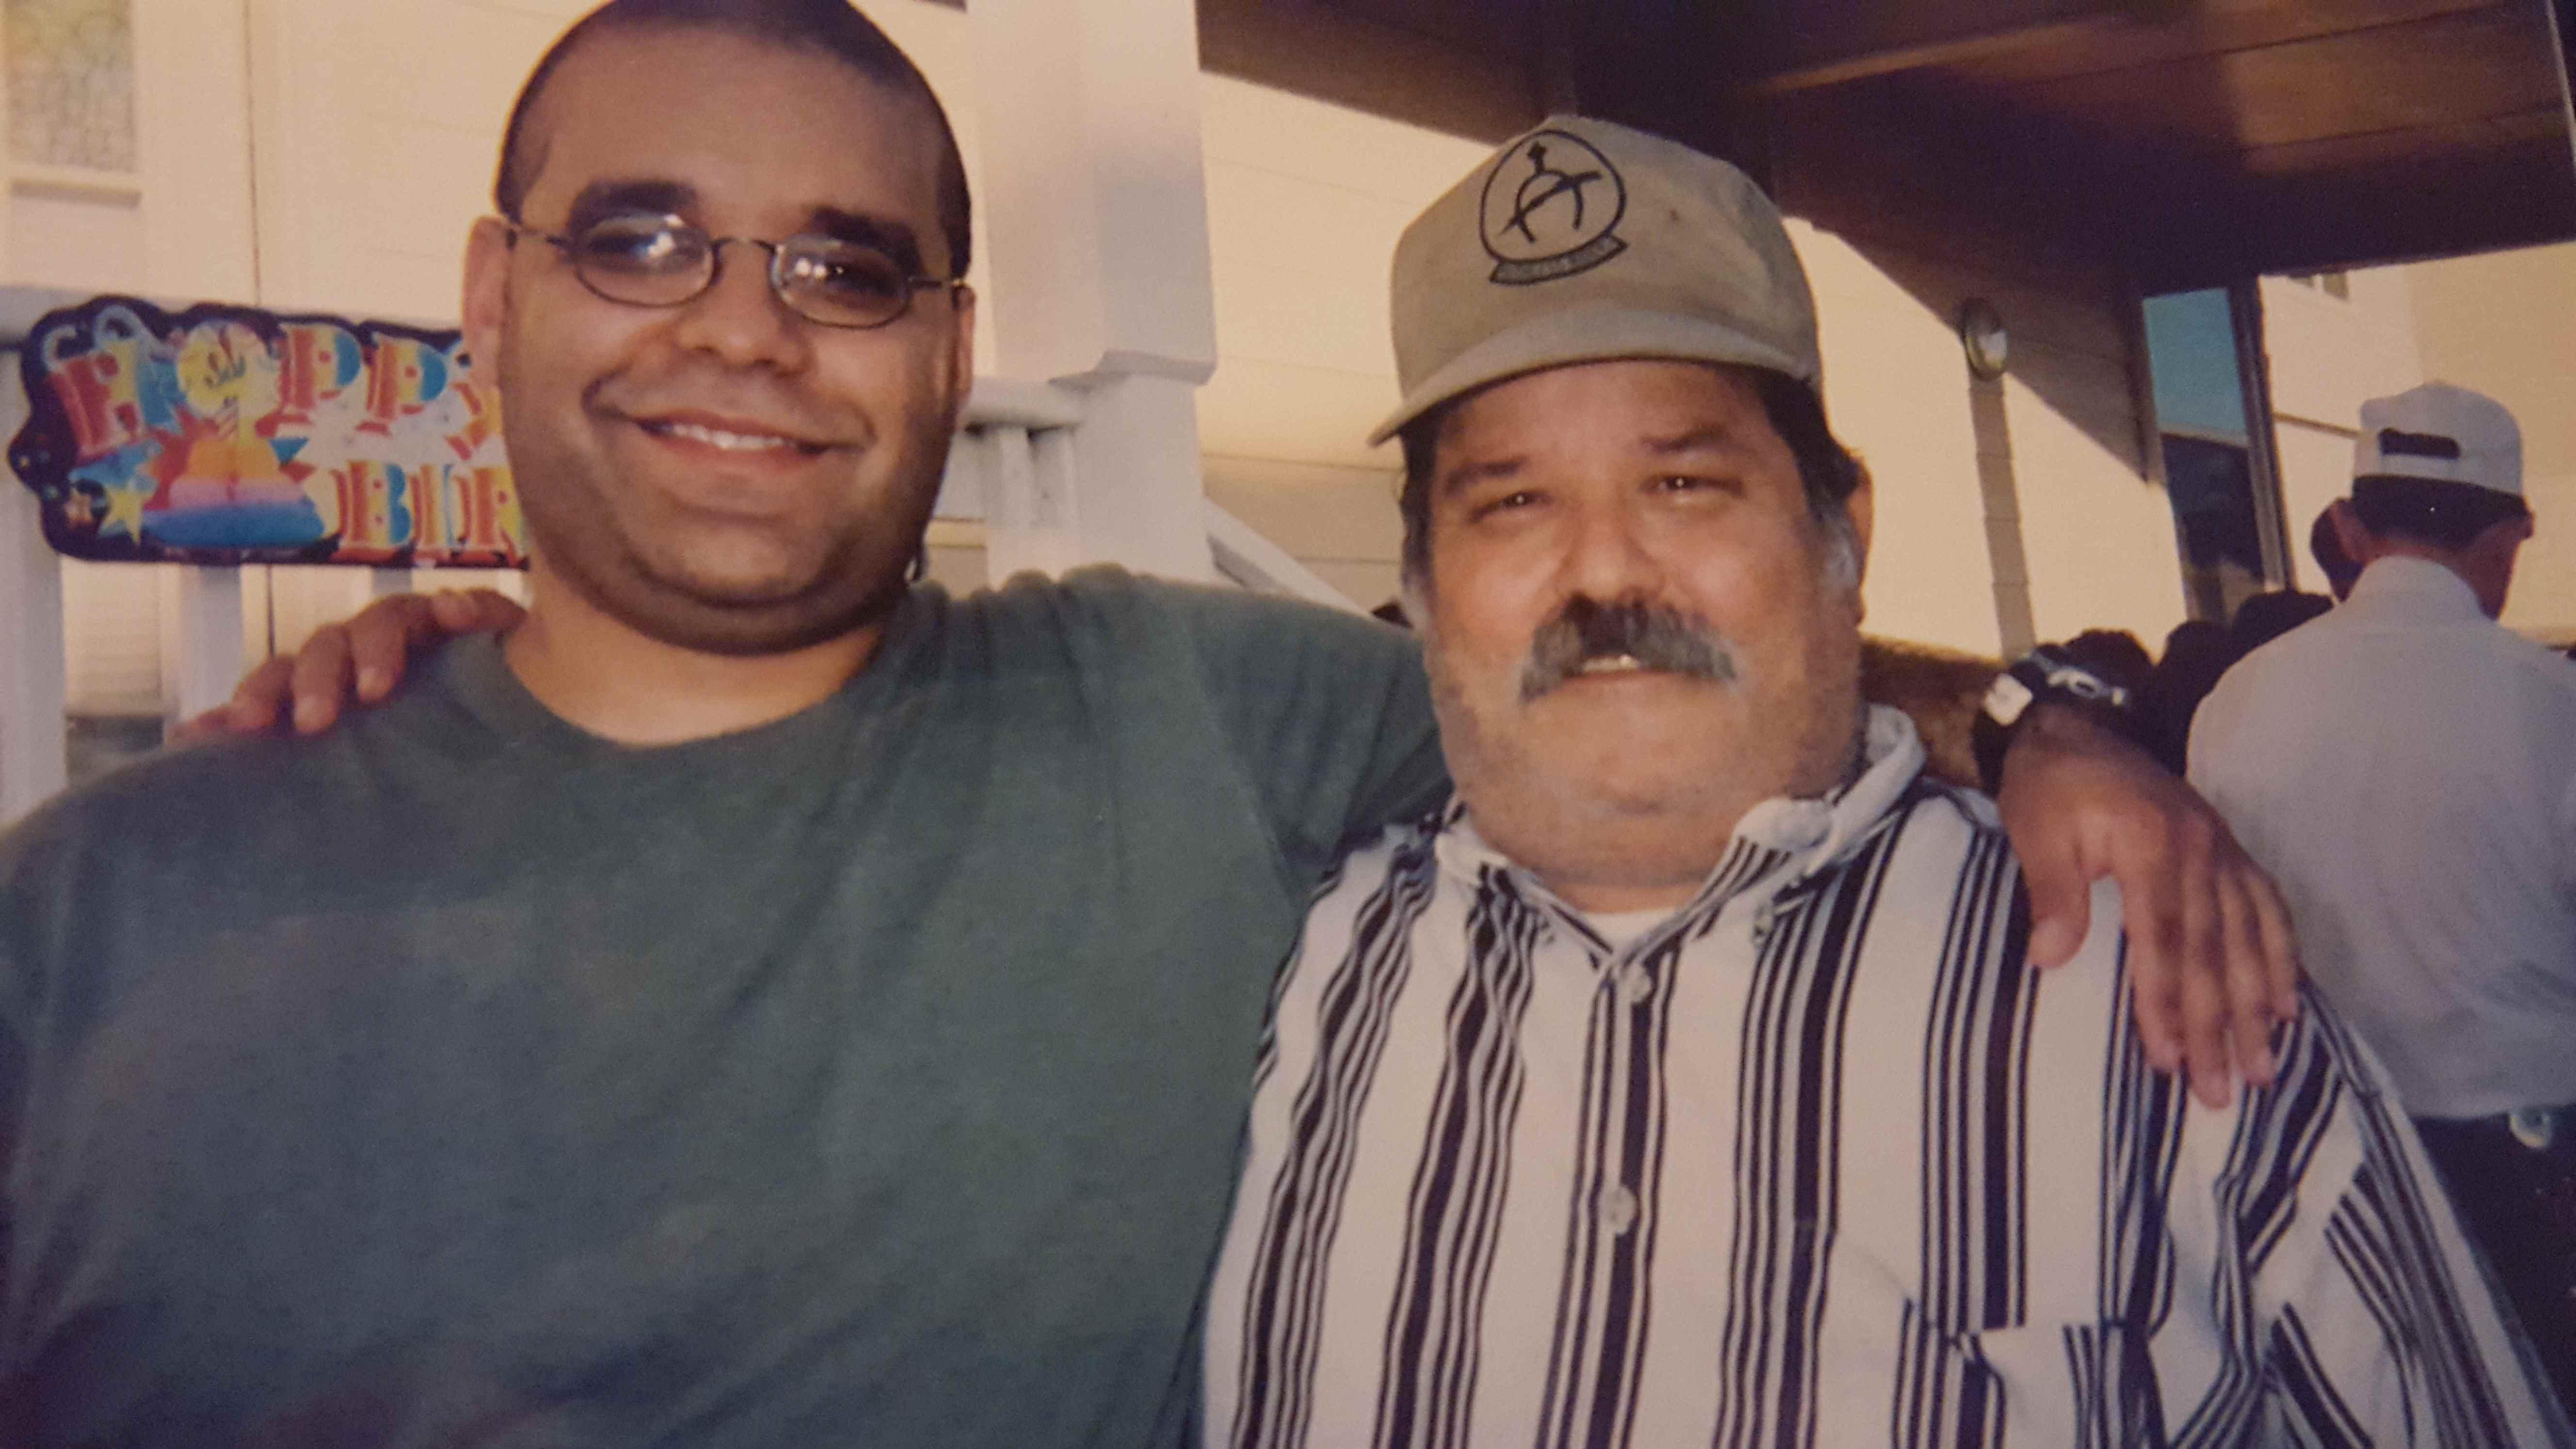 Jose with nephew Eloy